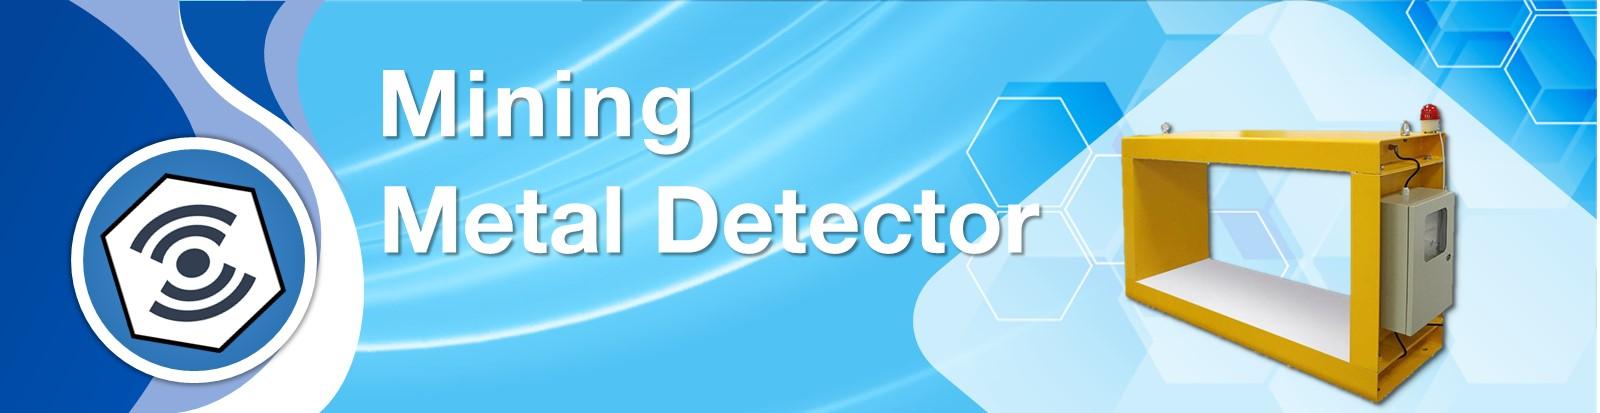 Mining Metal Detector